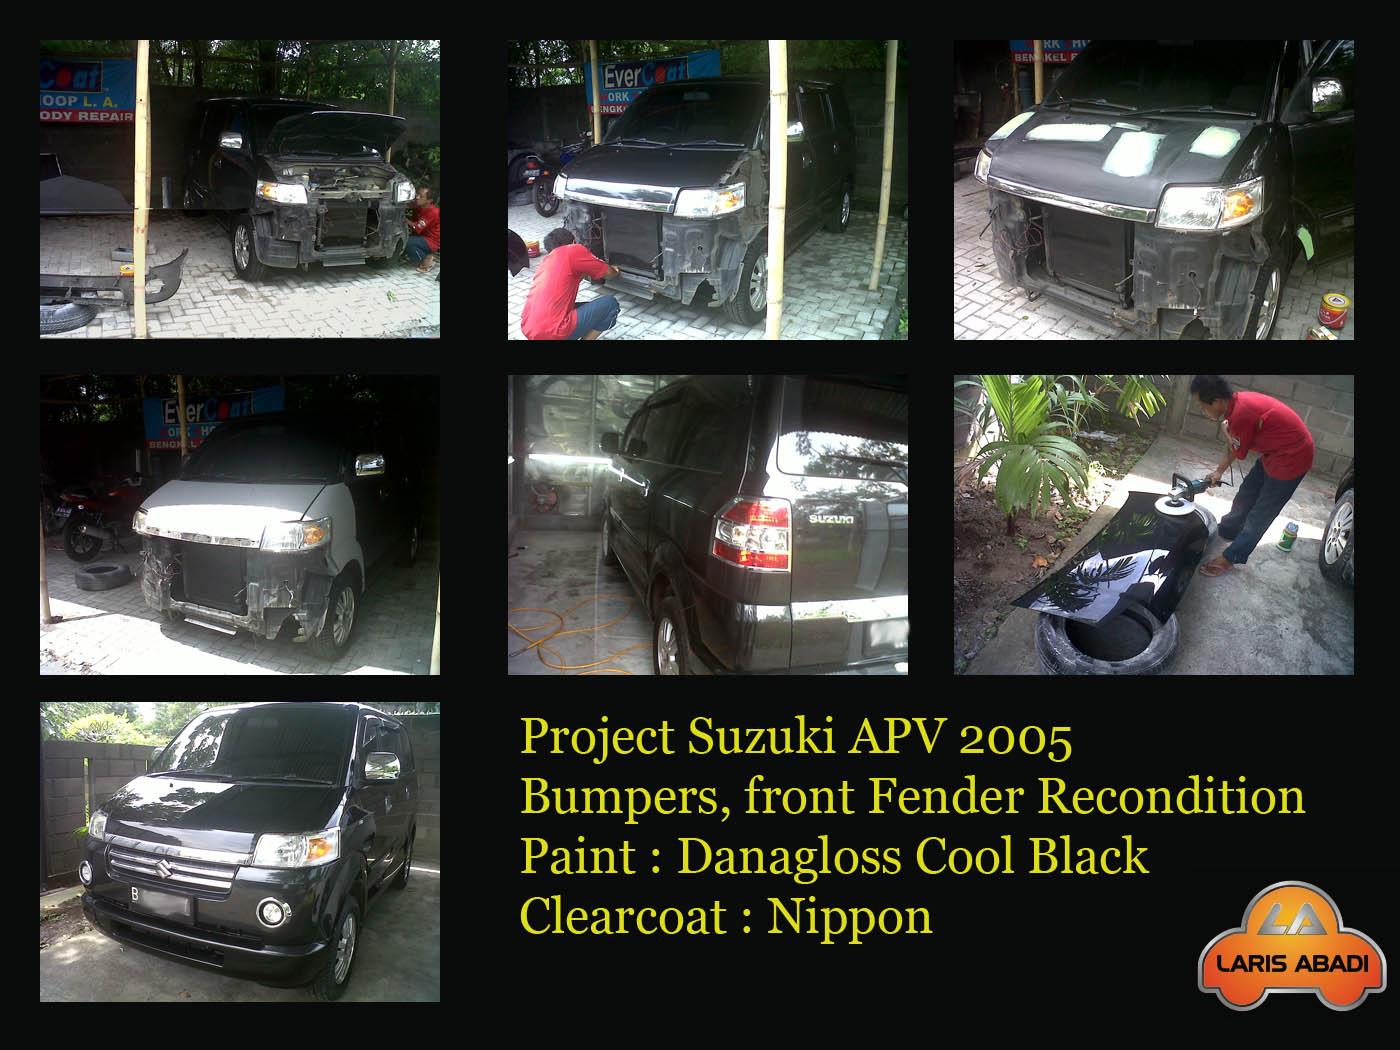 Suzuki APV X 2005